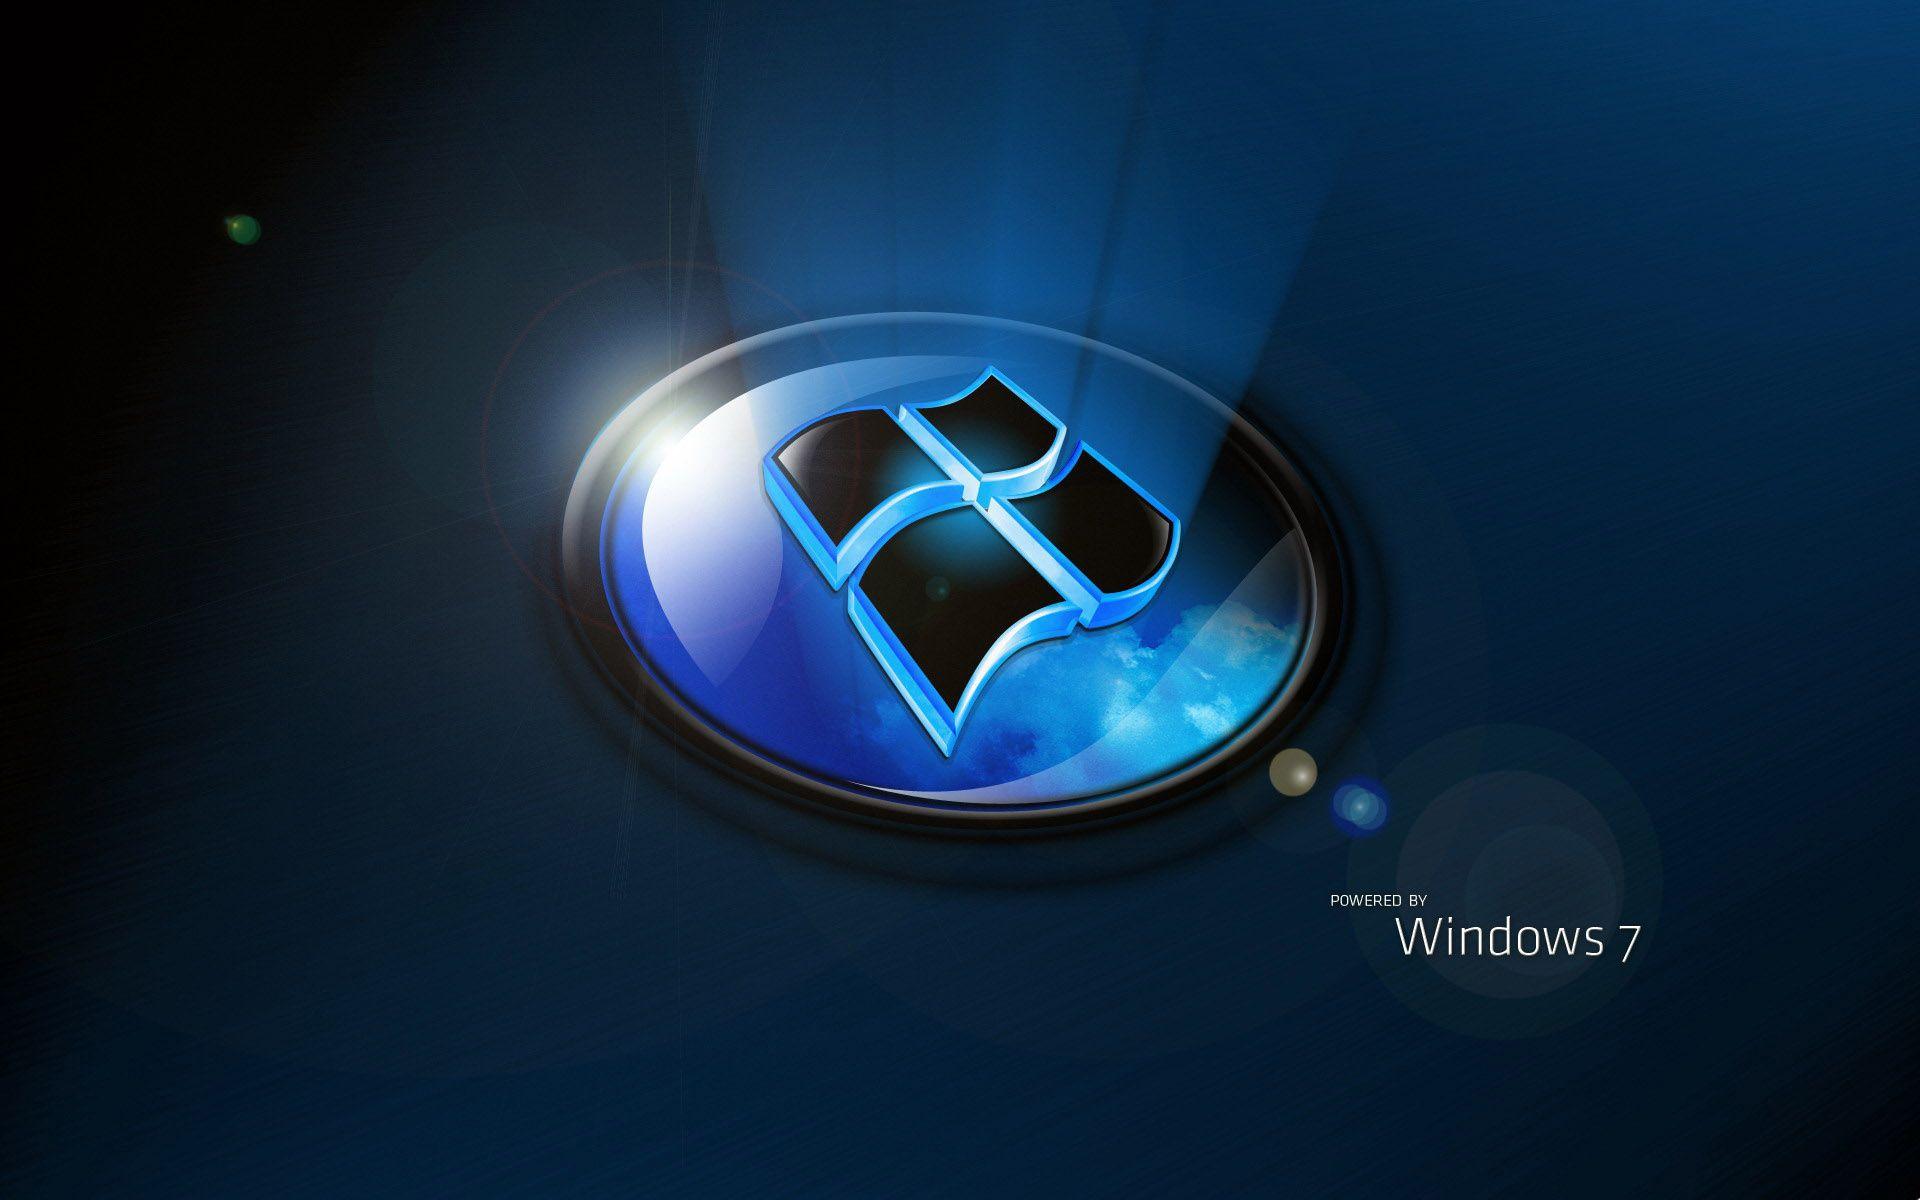 Desktop Wallpaper HD d Windows HD Wallpapers desktop Wallpaper 1920x1200